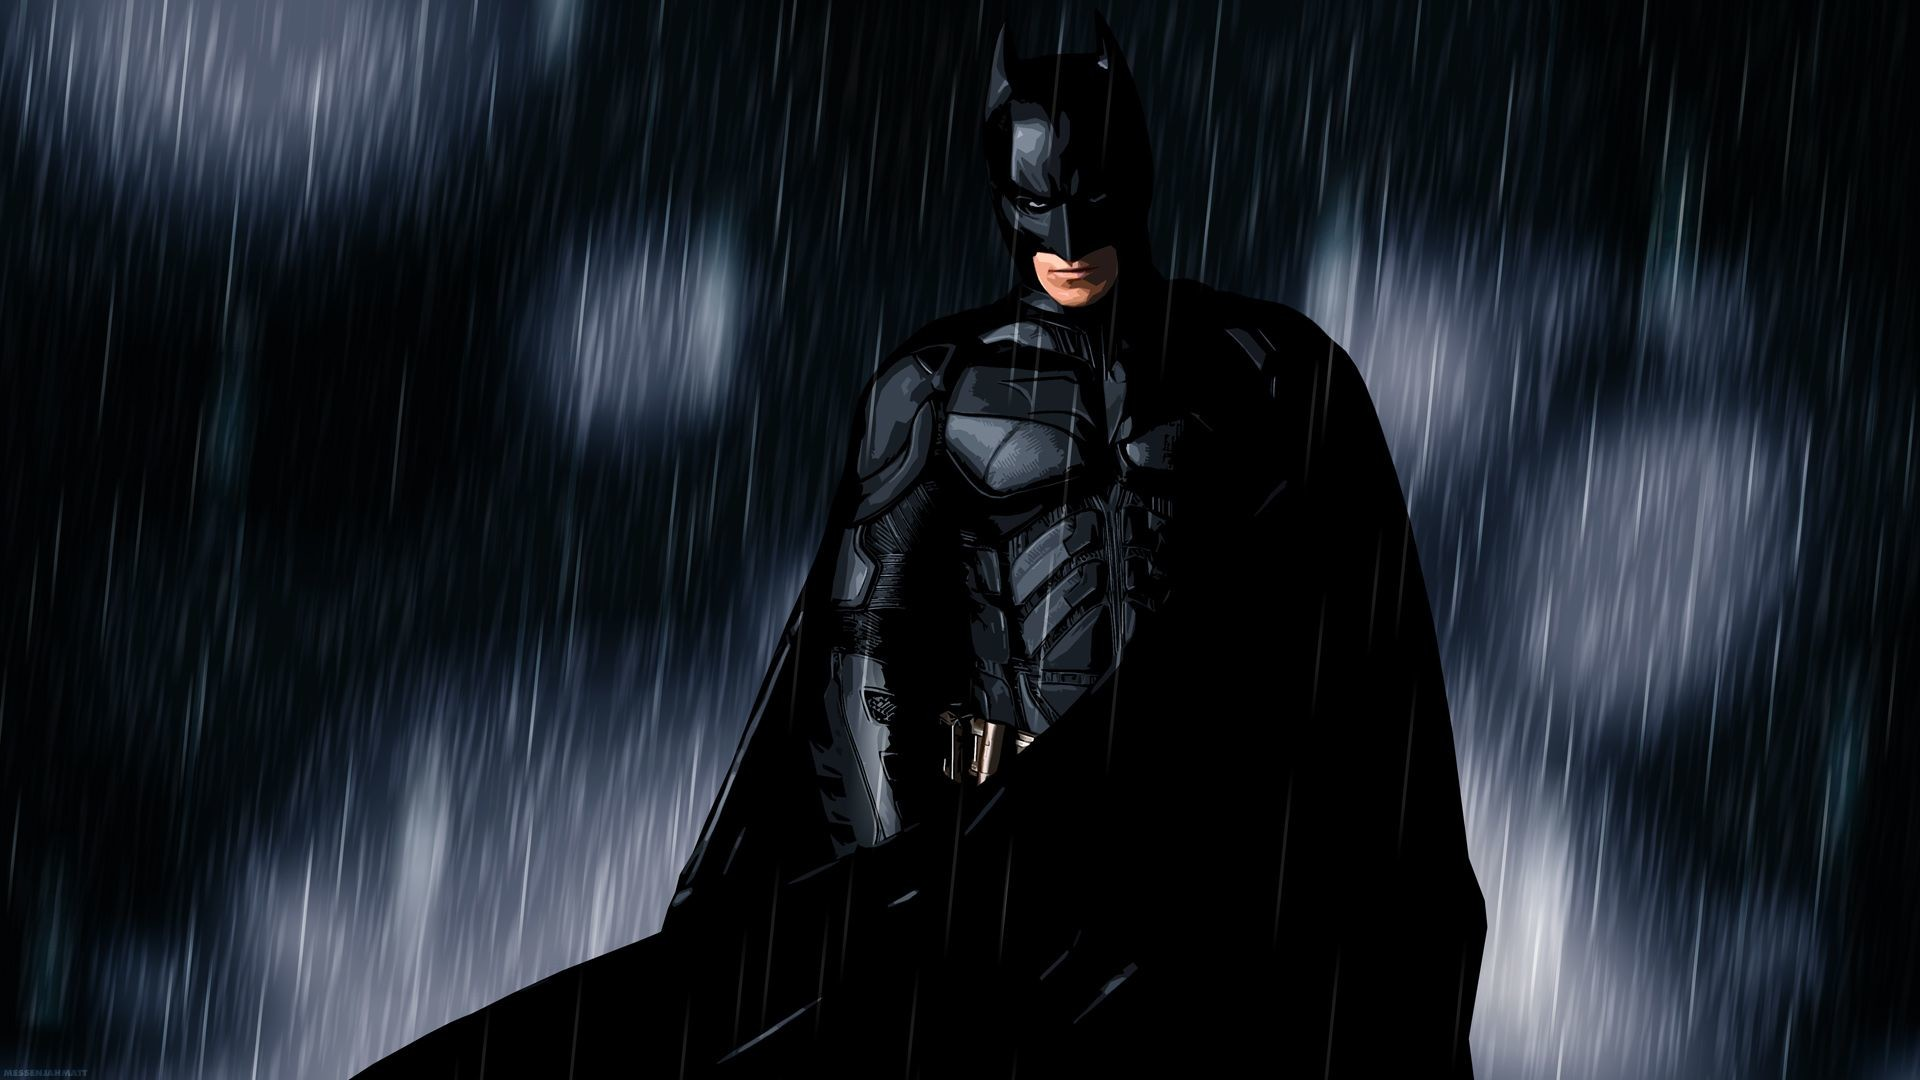 Batman HD Wallpapers p Batman Images Wallpapers Wallpapers)